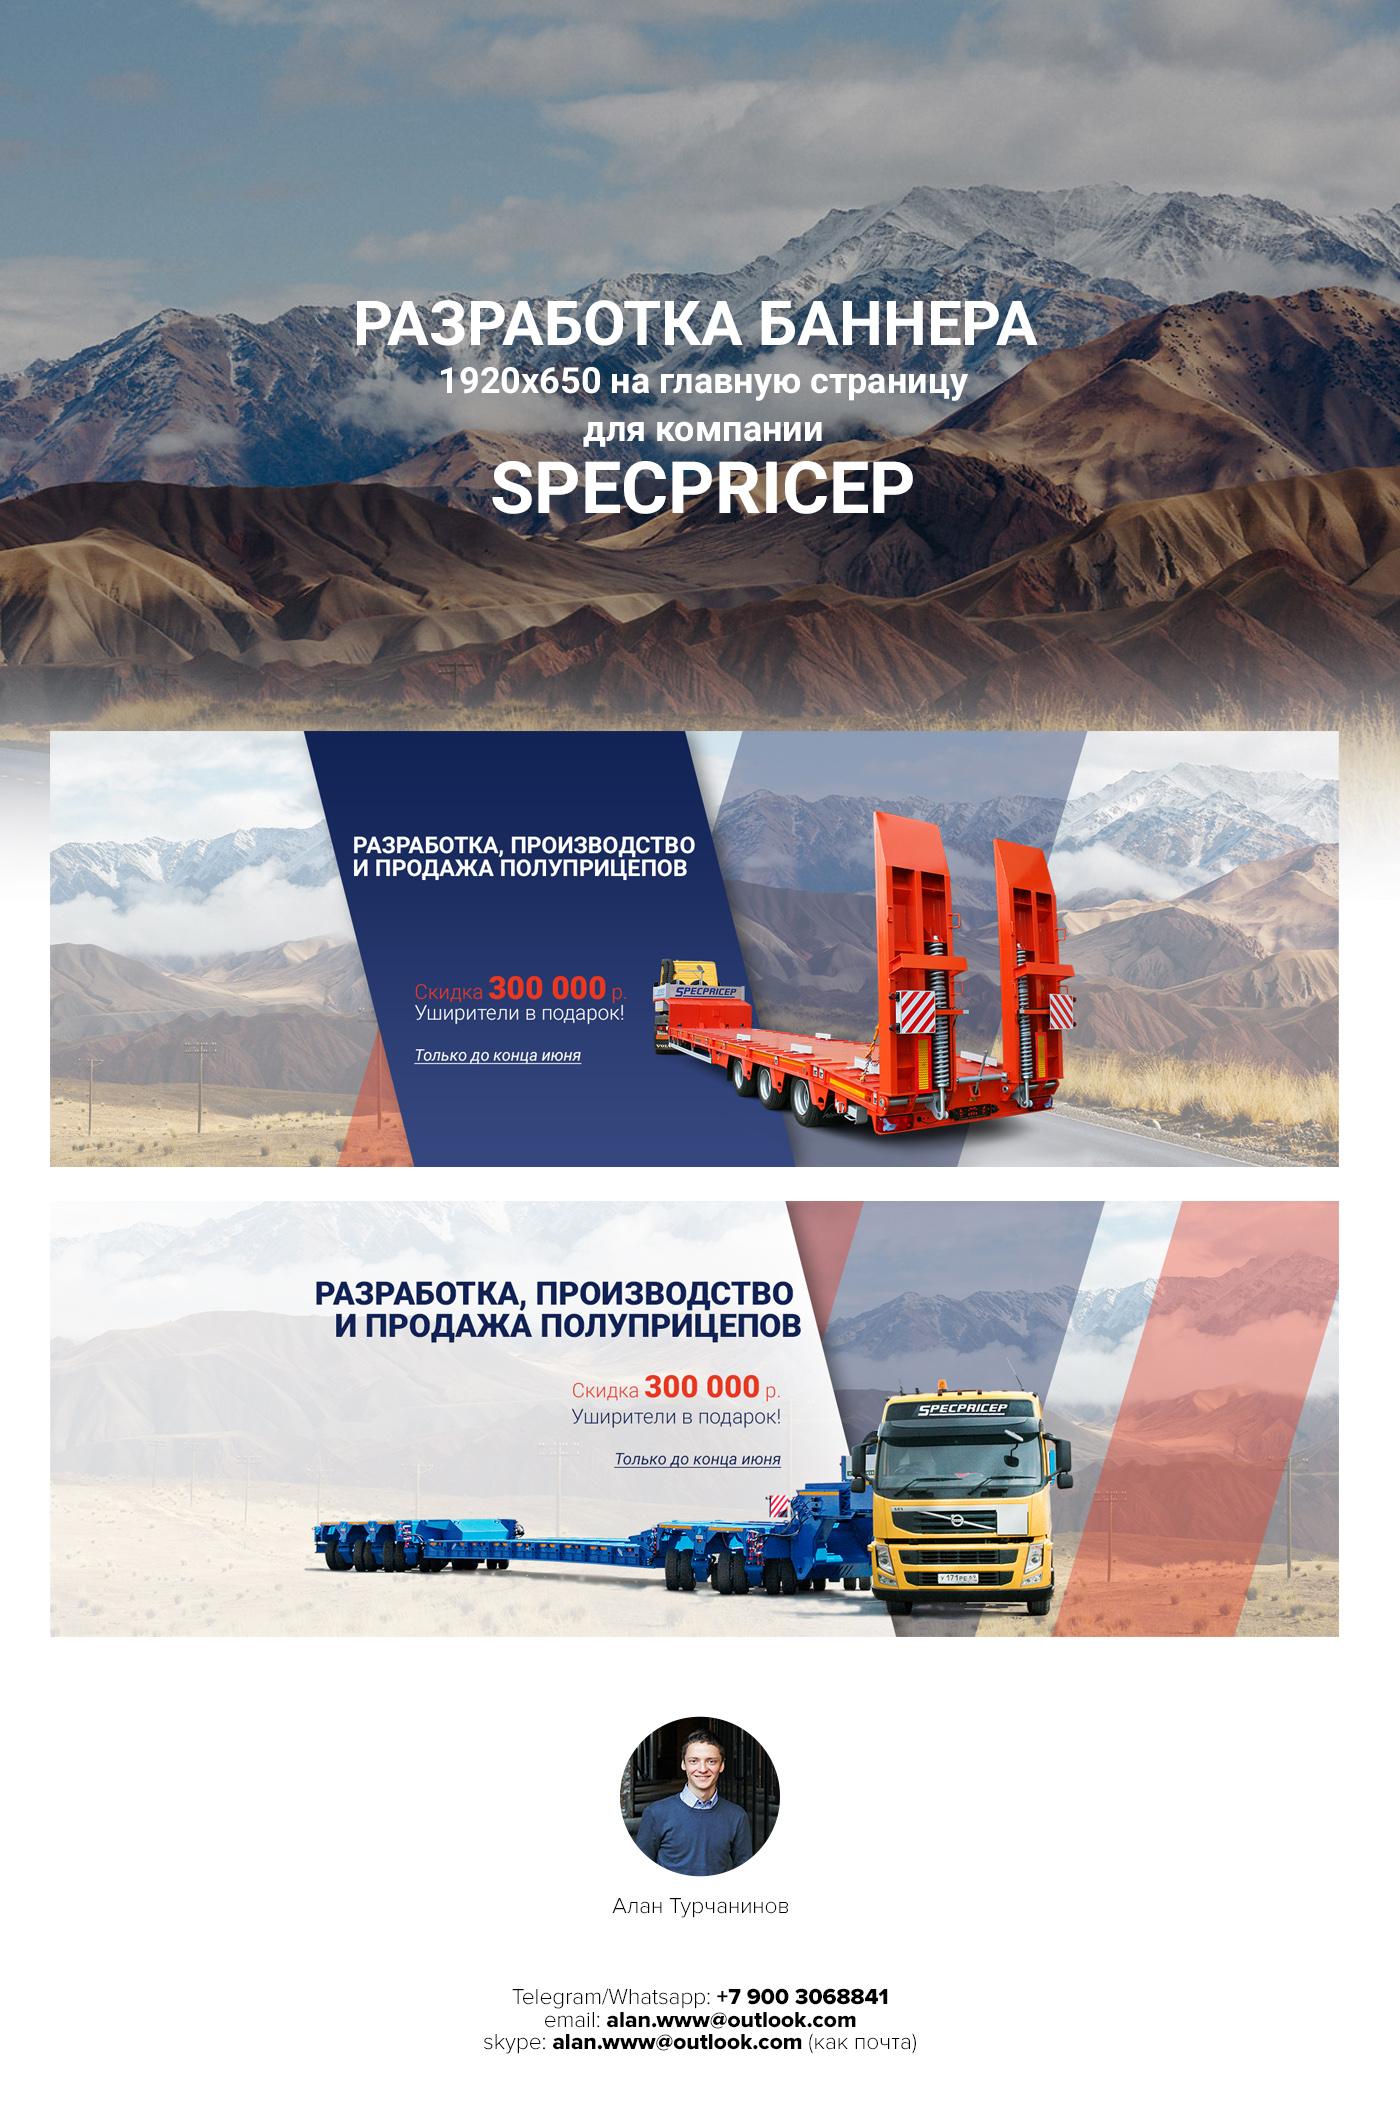 Баннеры для Specpricep